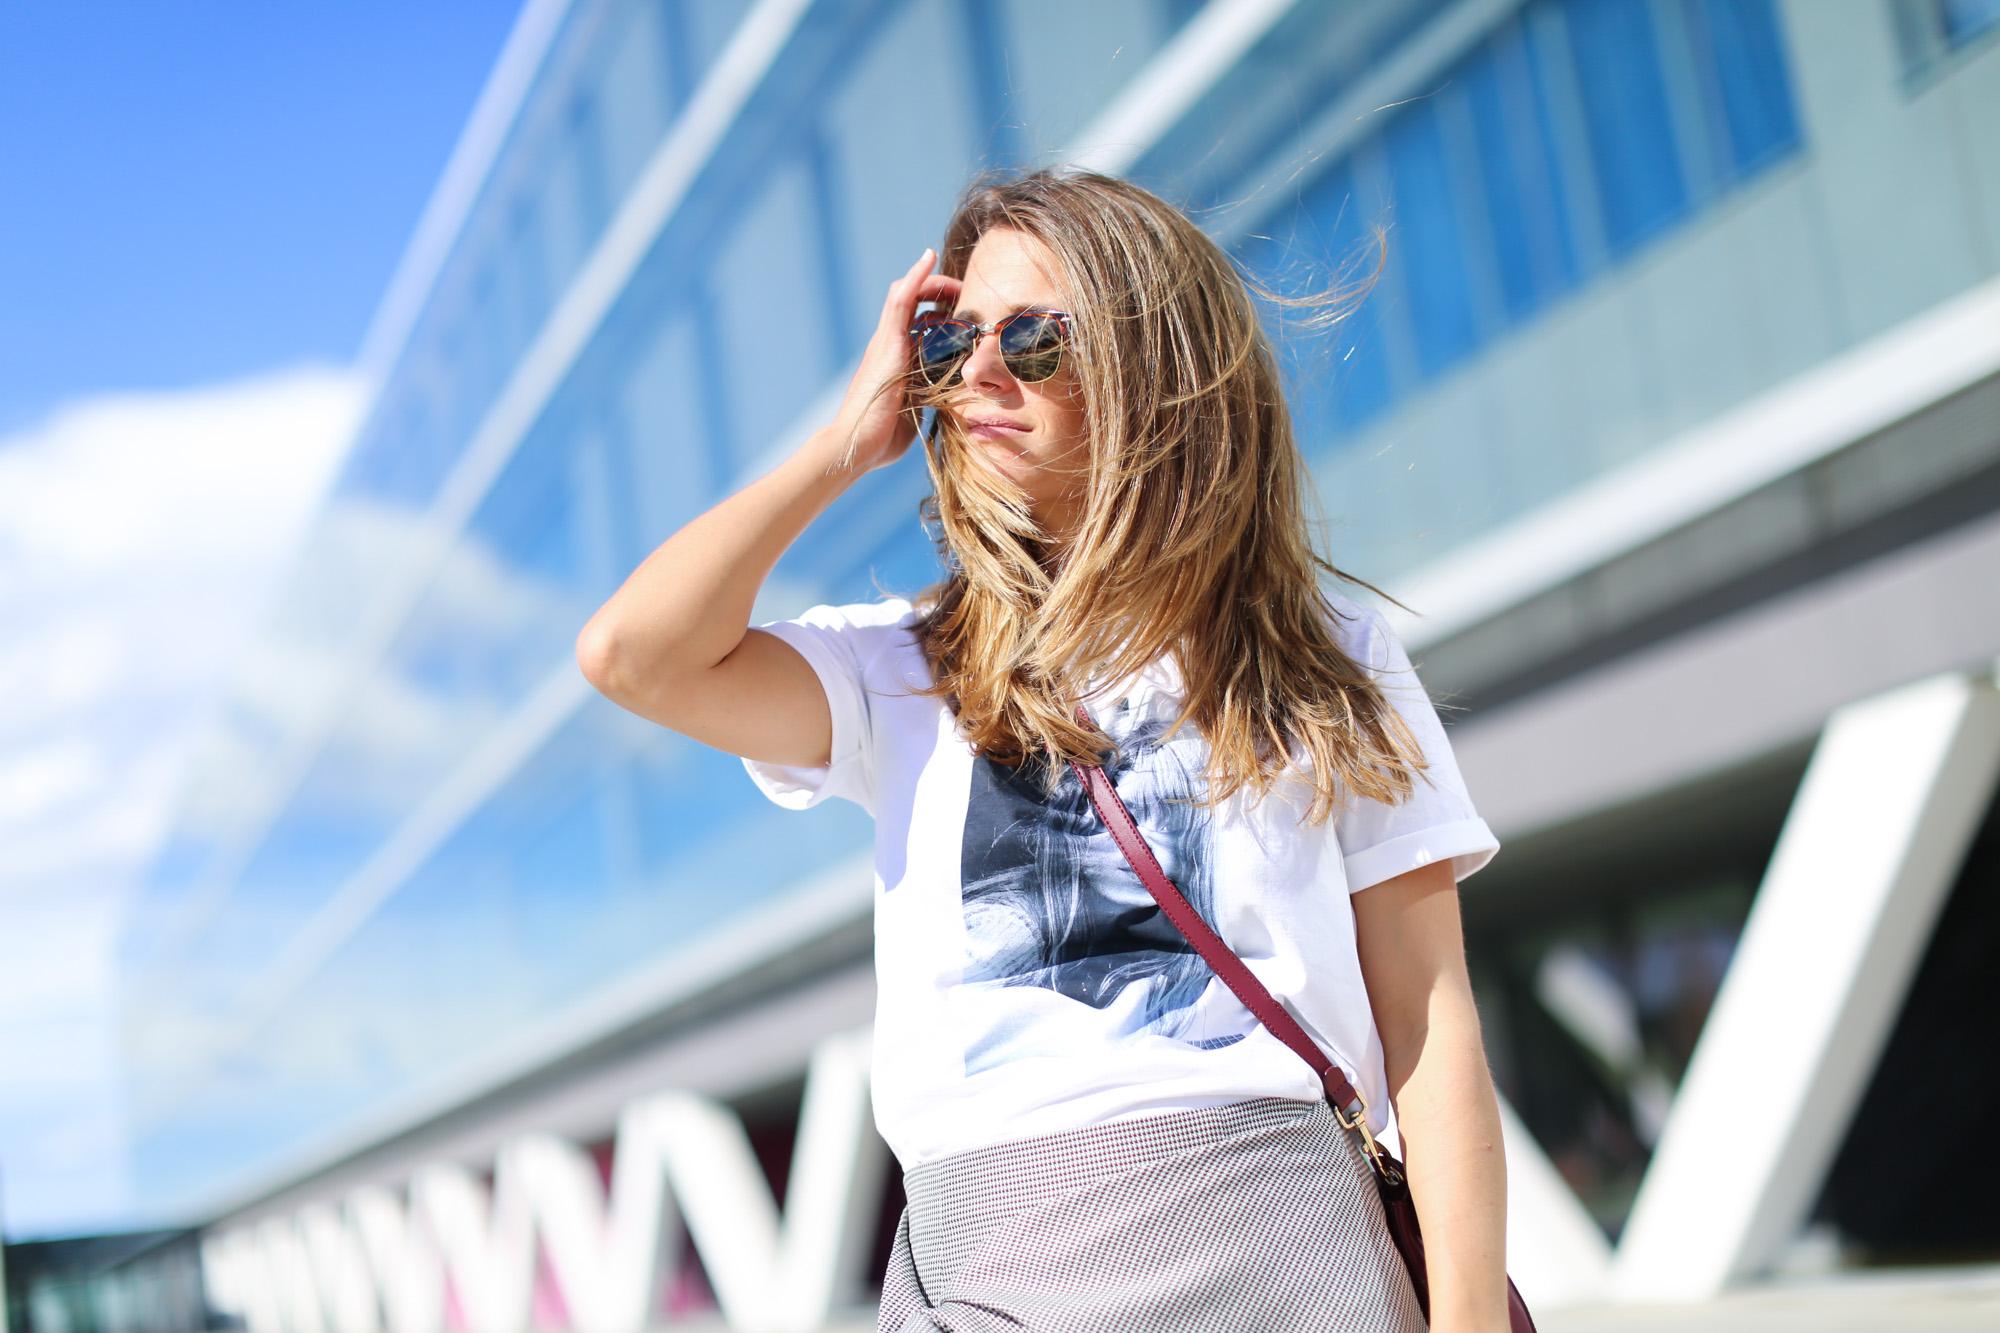 clochet_streetstyle_fashionblogger_leatherloafers_zara_asymmetric_toothgooseminiskirt-5